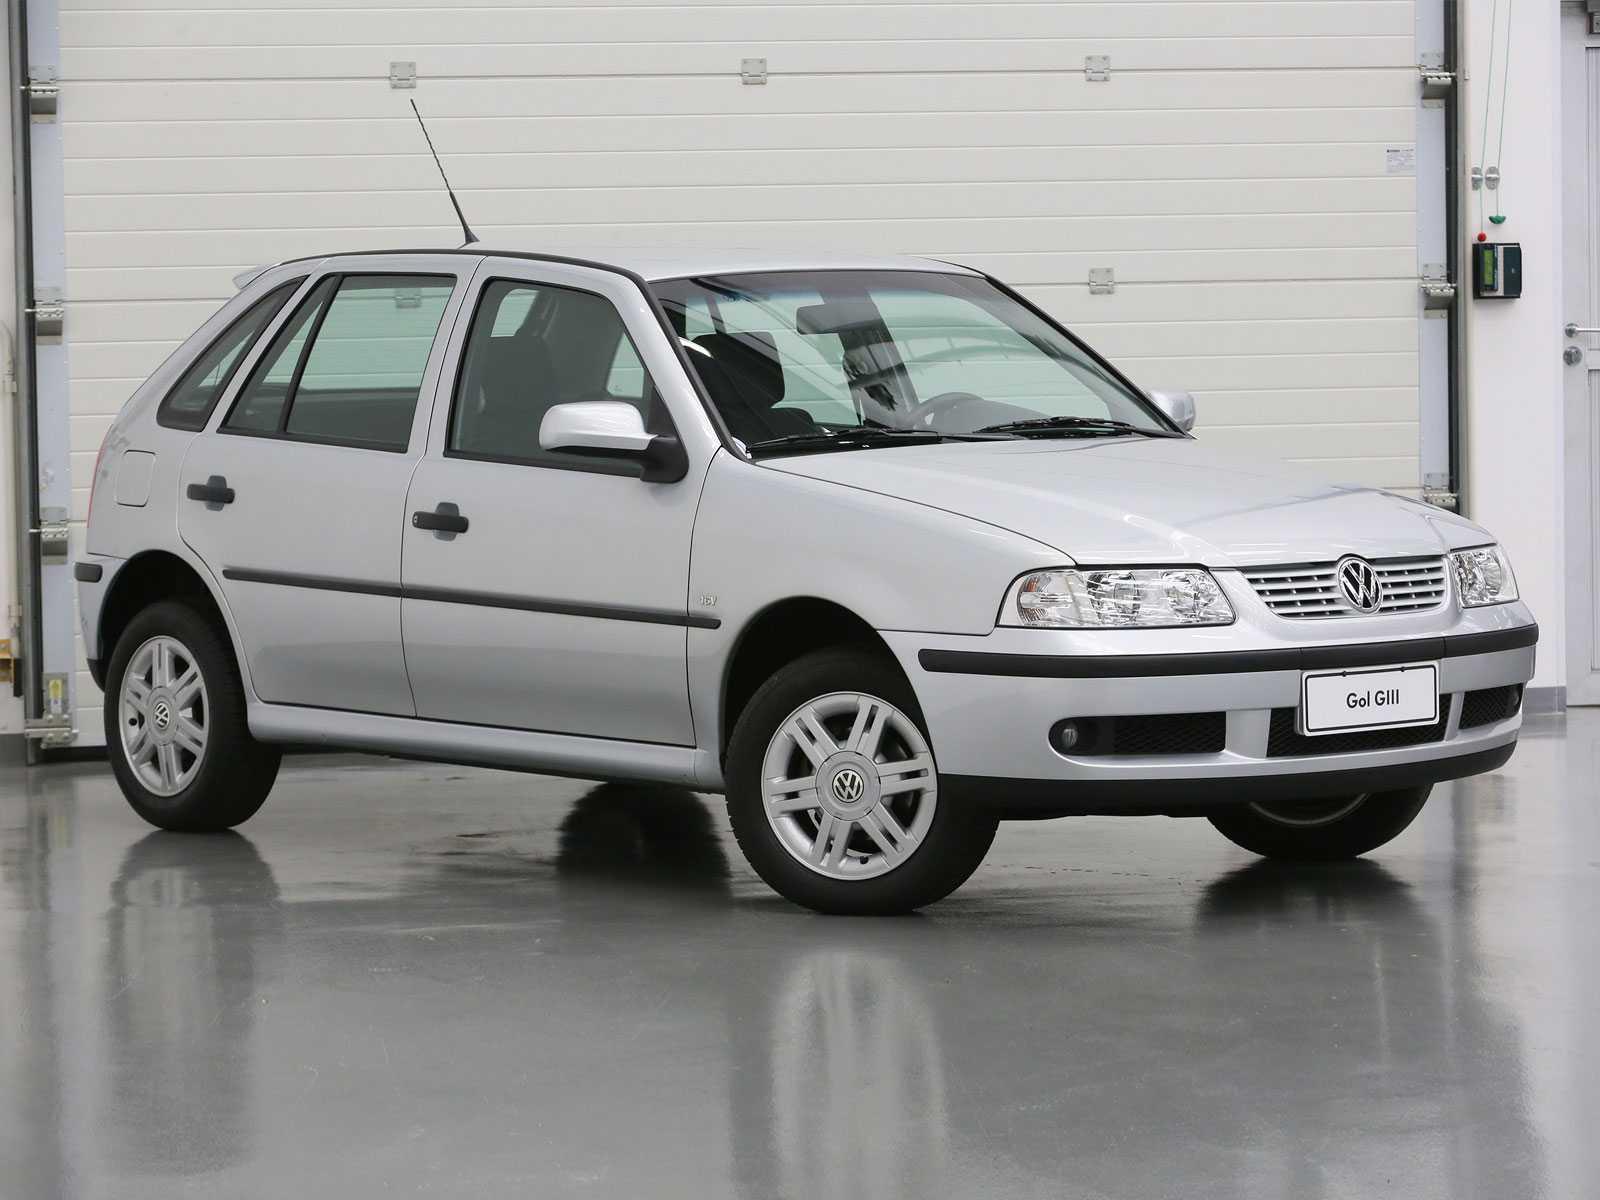 VolkswagenGol 1999 - ângulo frontal